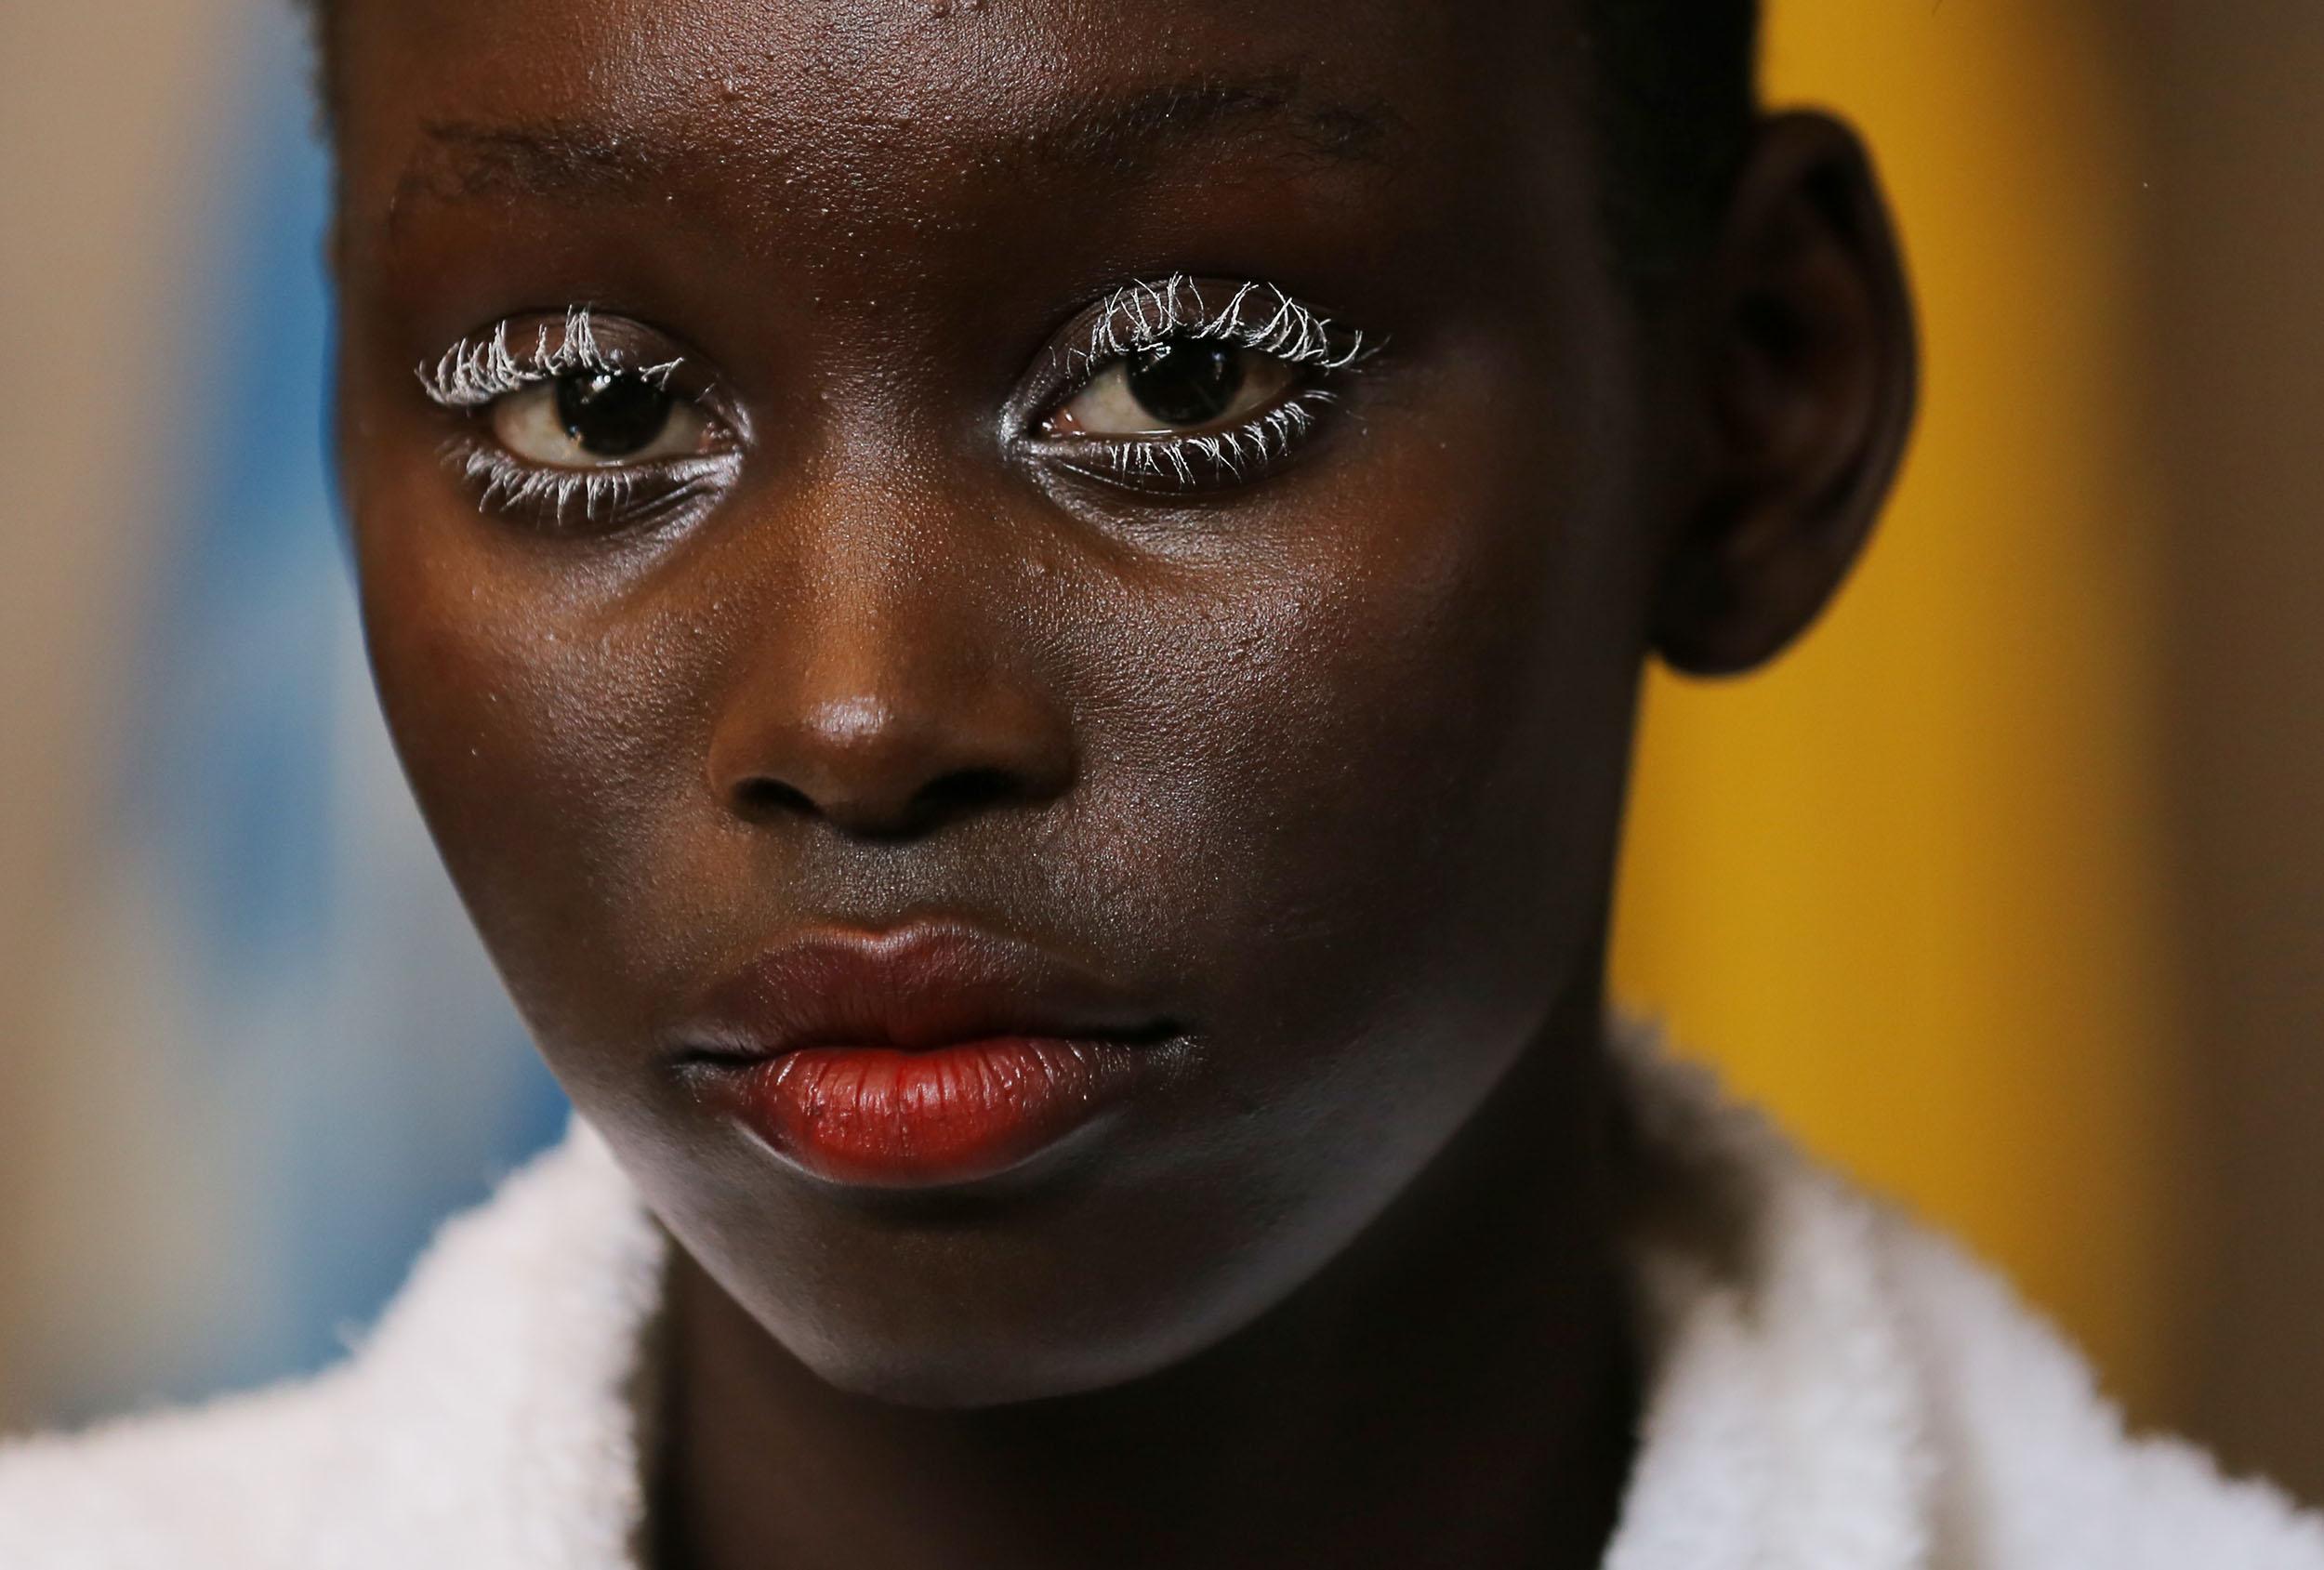 A model for designer Gary Bigeni looks on backstage during Fashion Week Australia in Sydney, Australia.